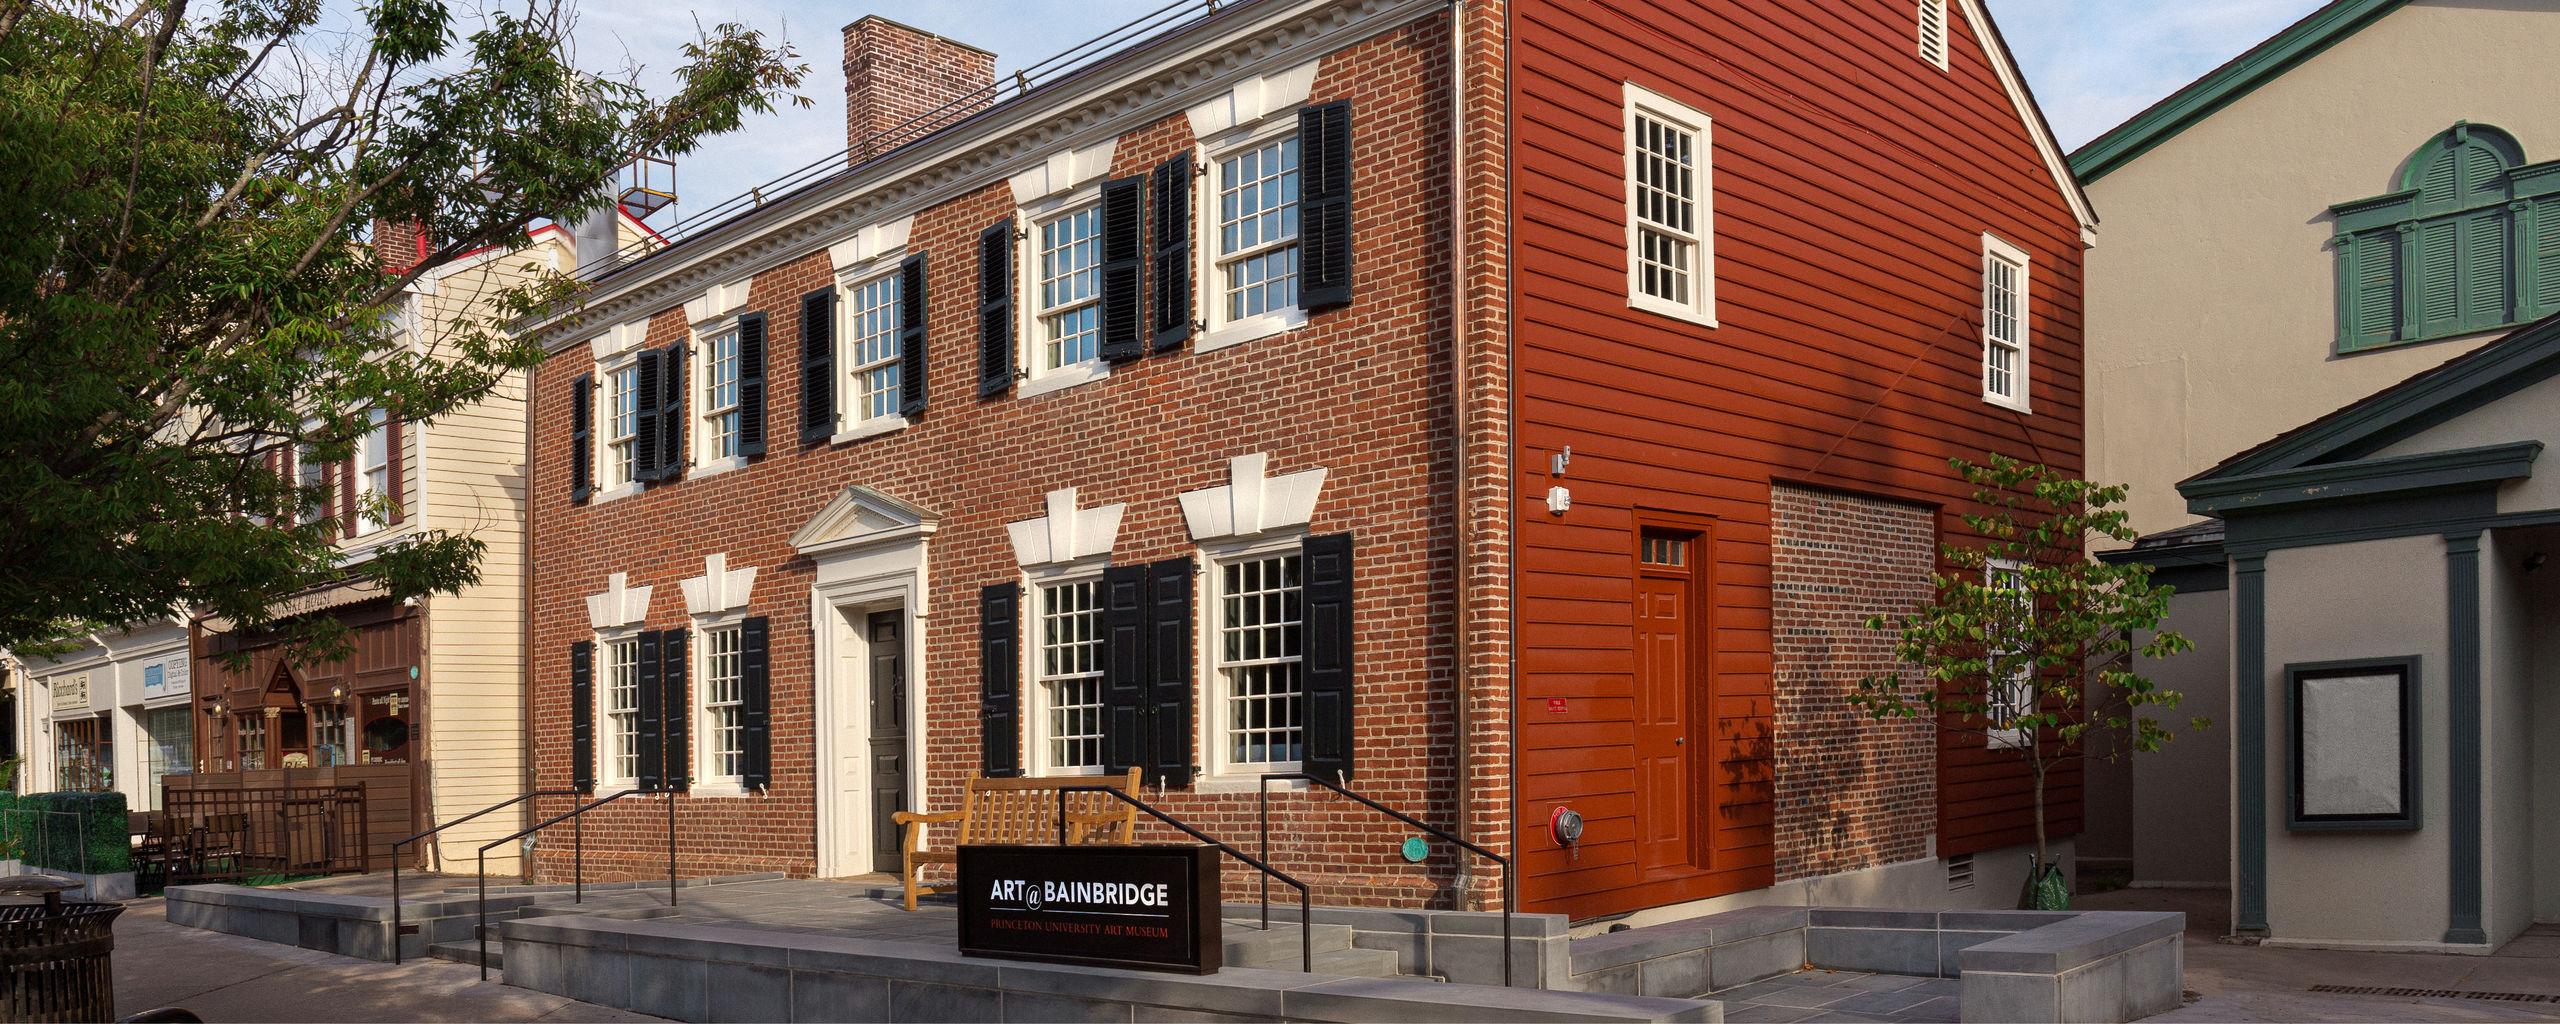 Brick and sided exterior of the Art@Bainbridge building.